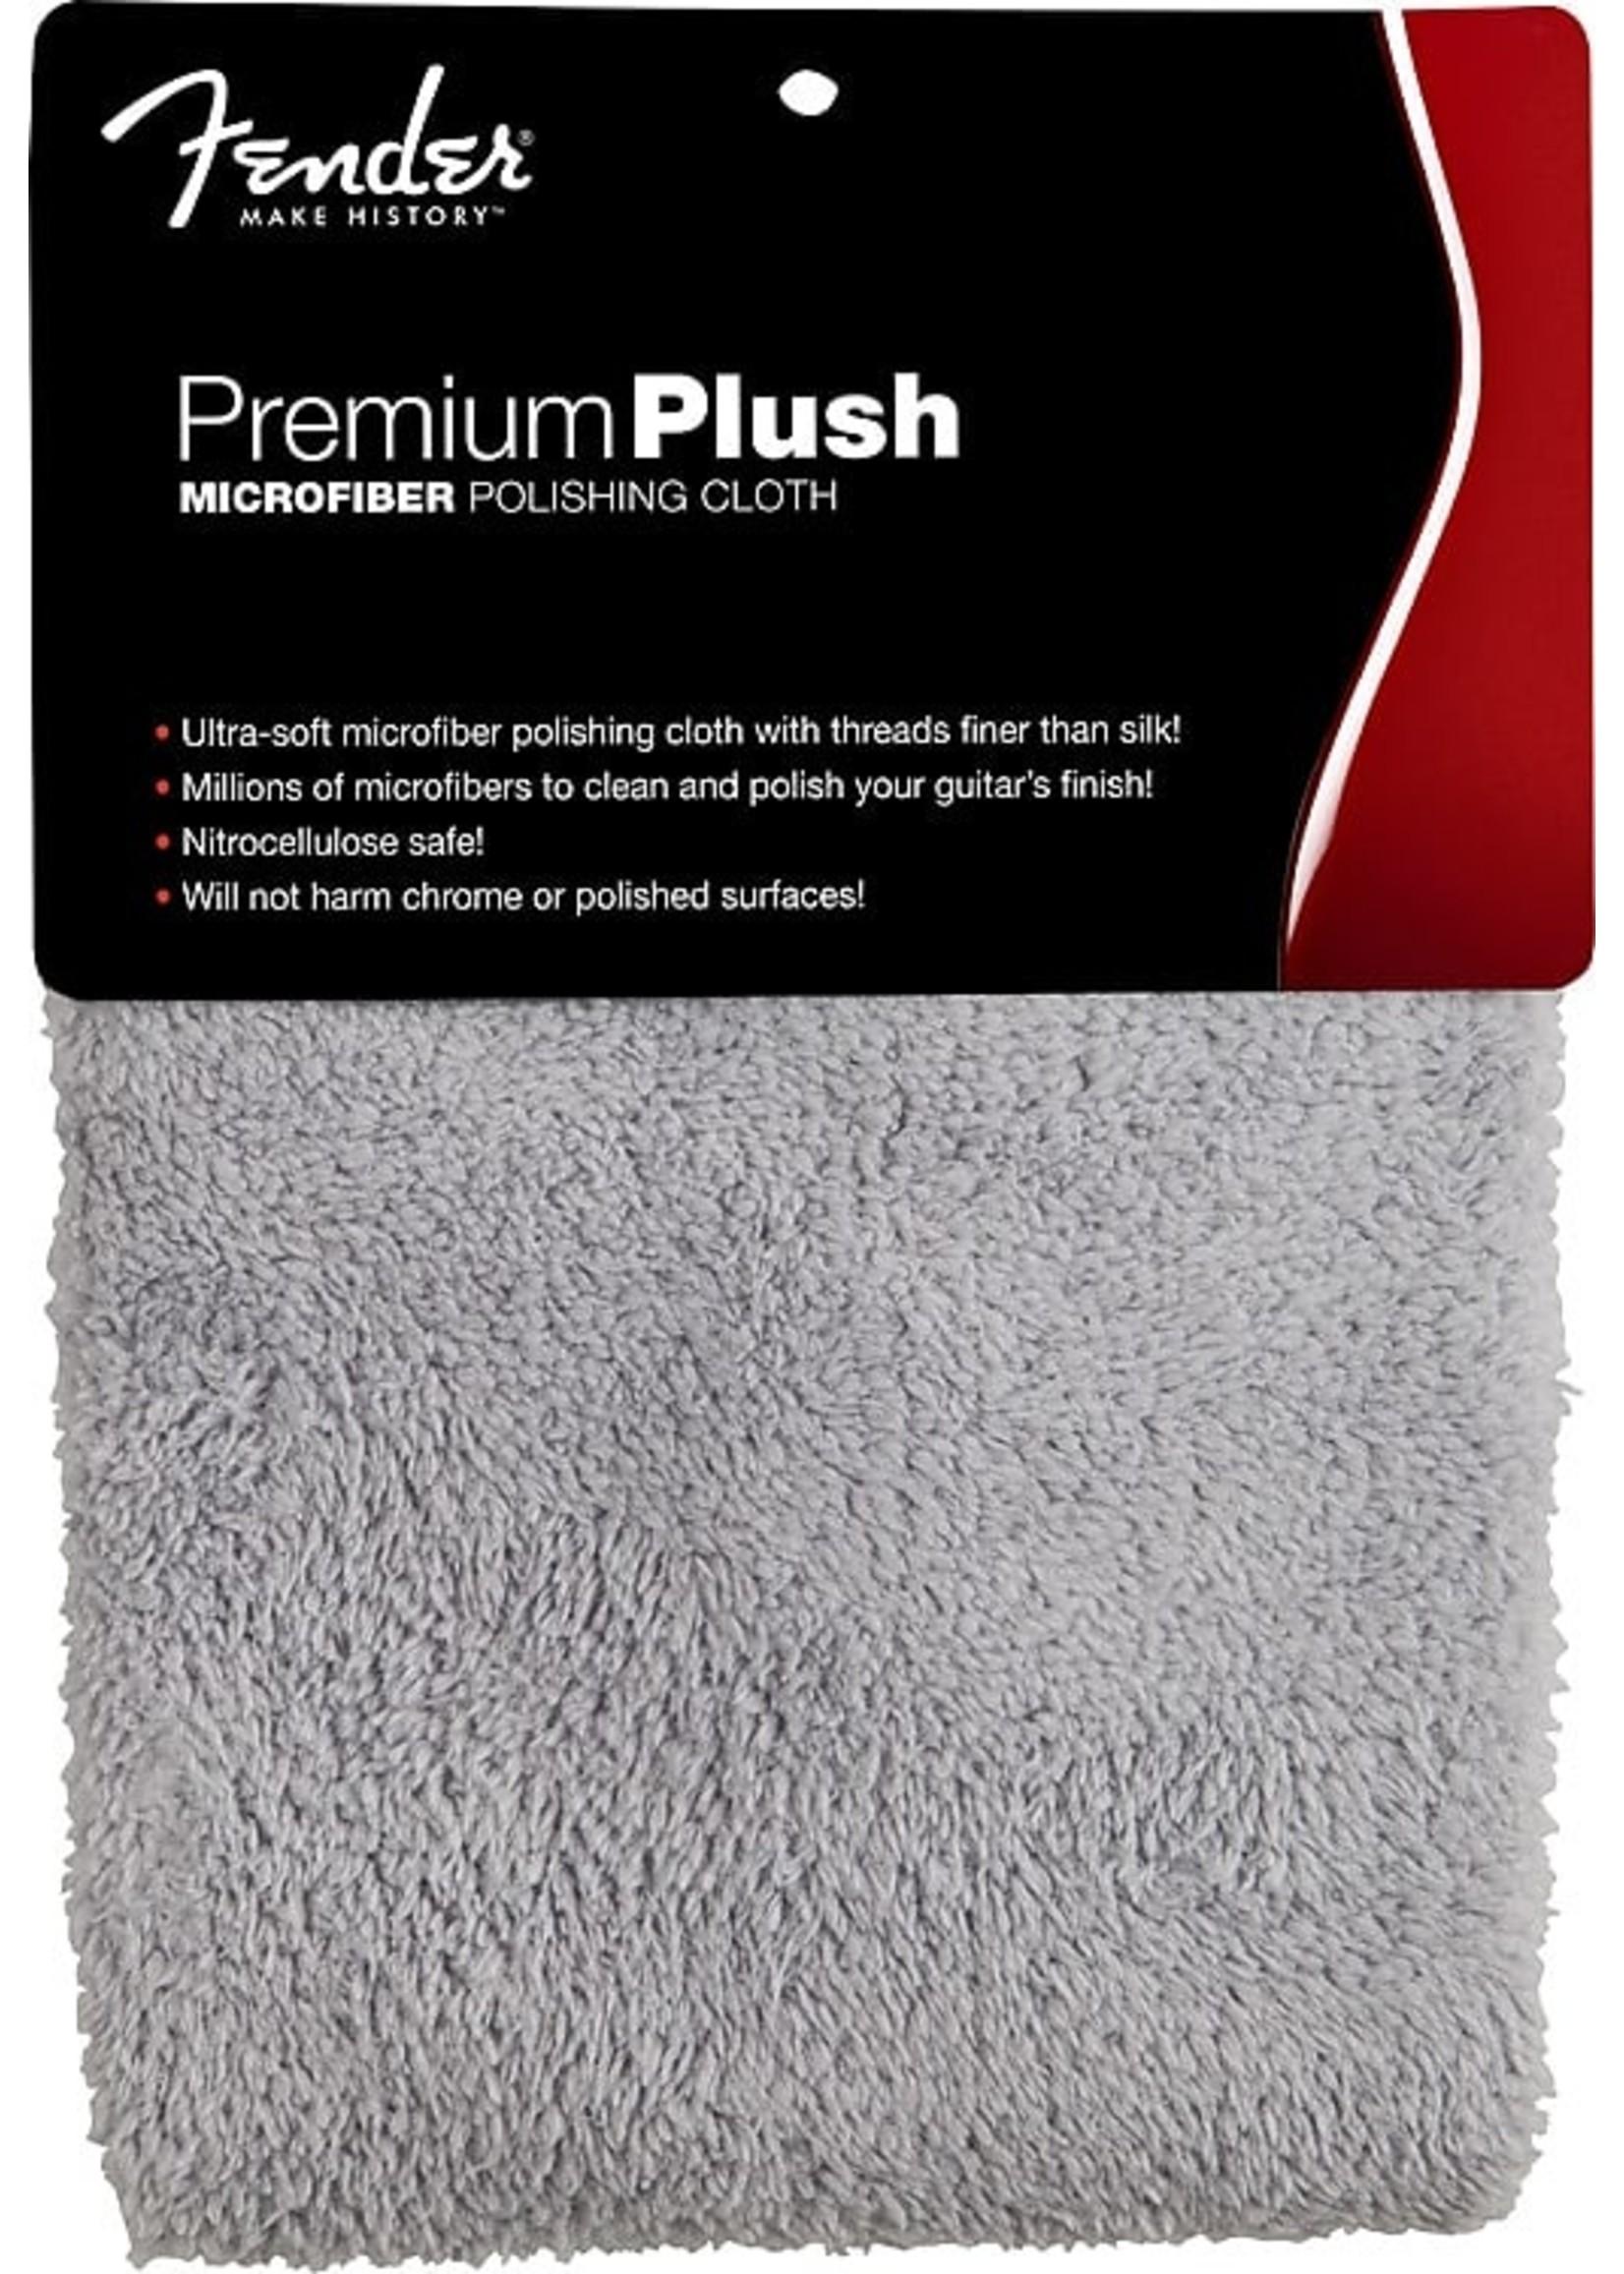 Fender Fender Premium Plush Microfiber Polishing Cloth, Gray